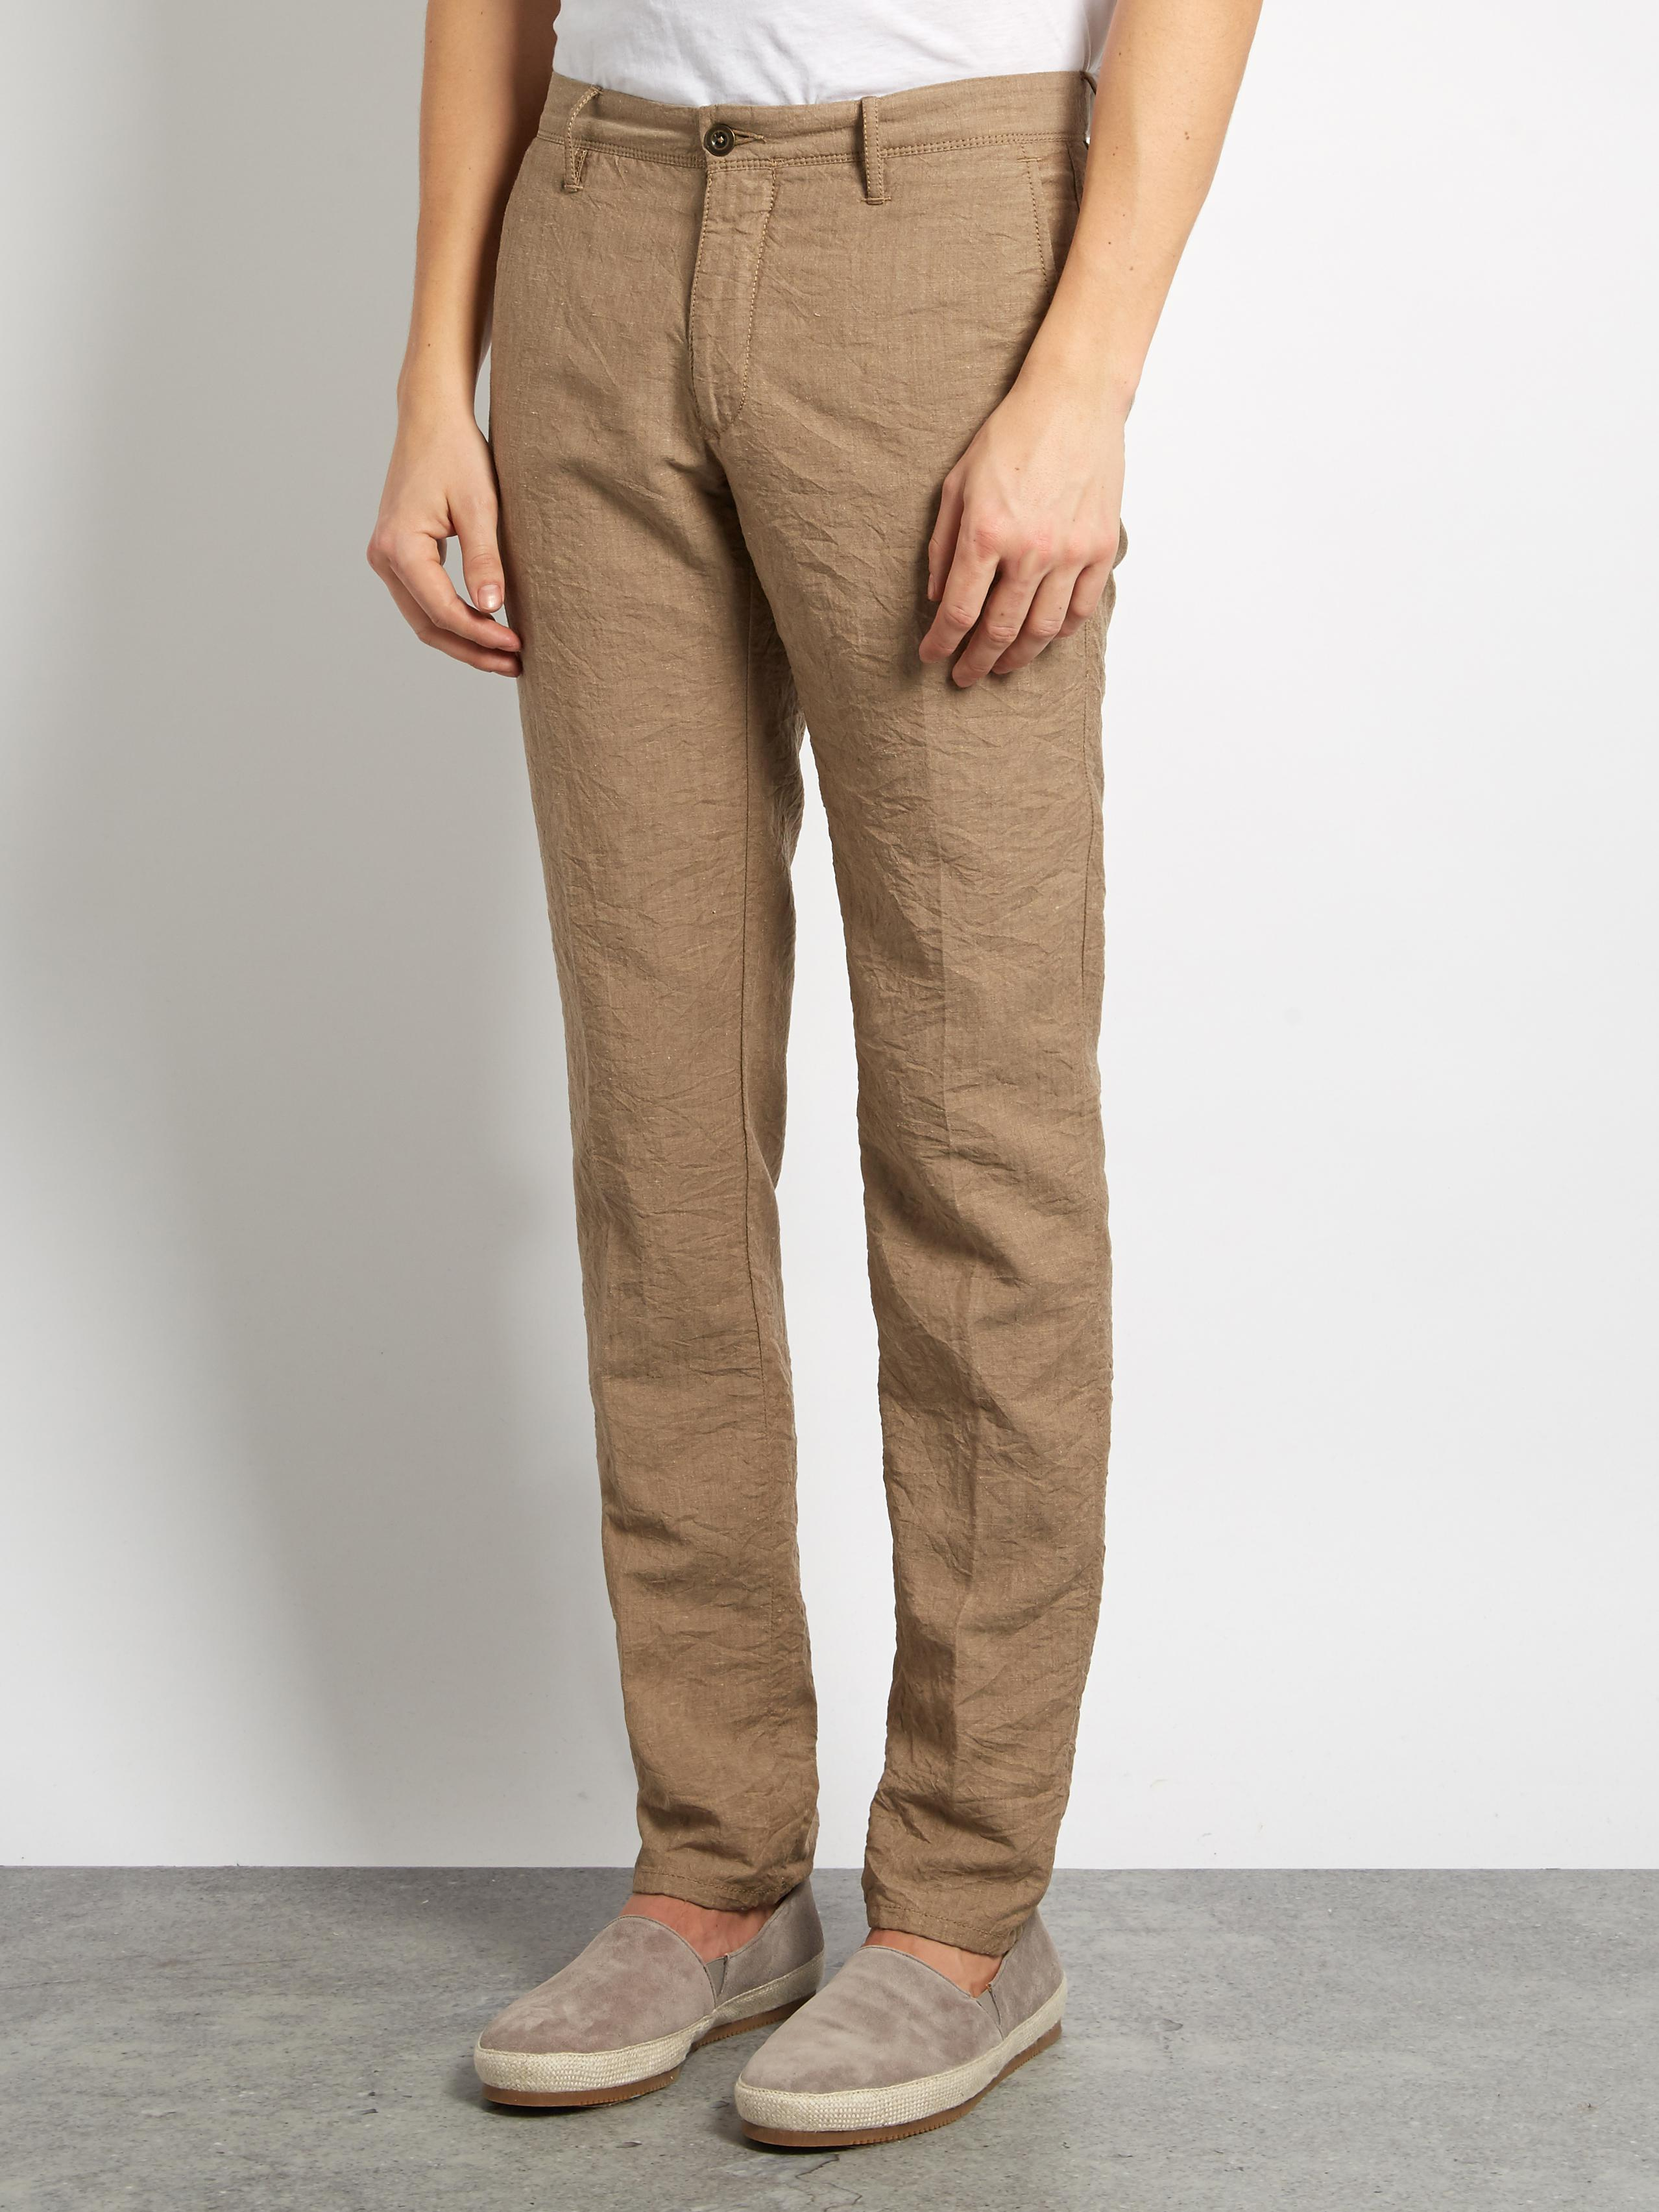 Incotex Slim-leg Linen-blend Chino Trousers in Beige (Natural) for Men